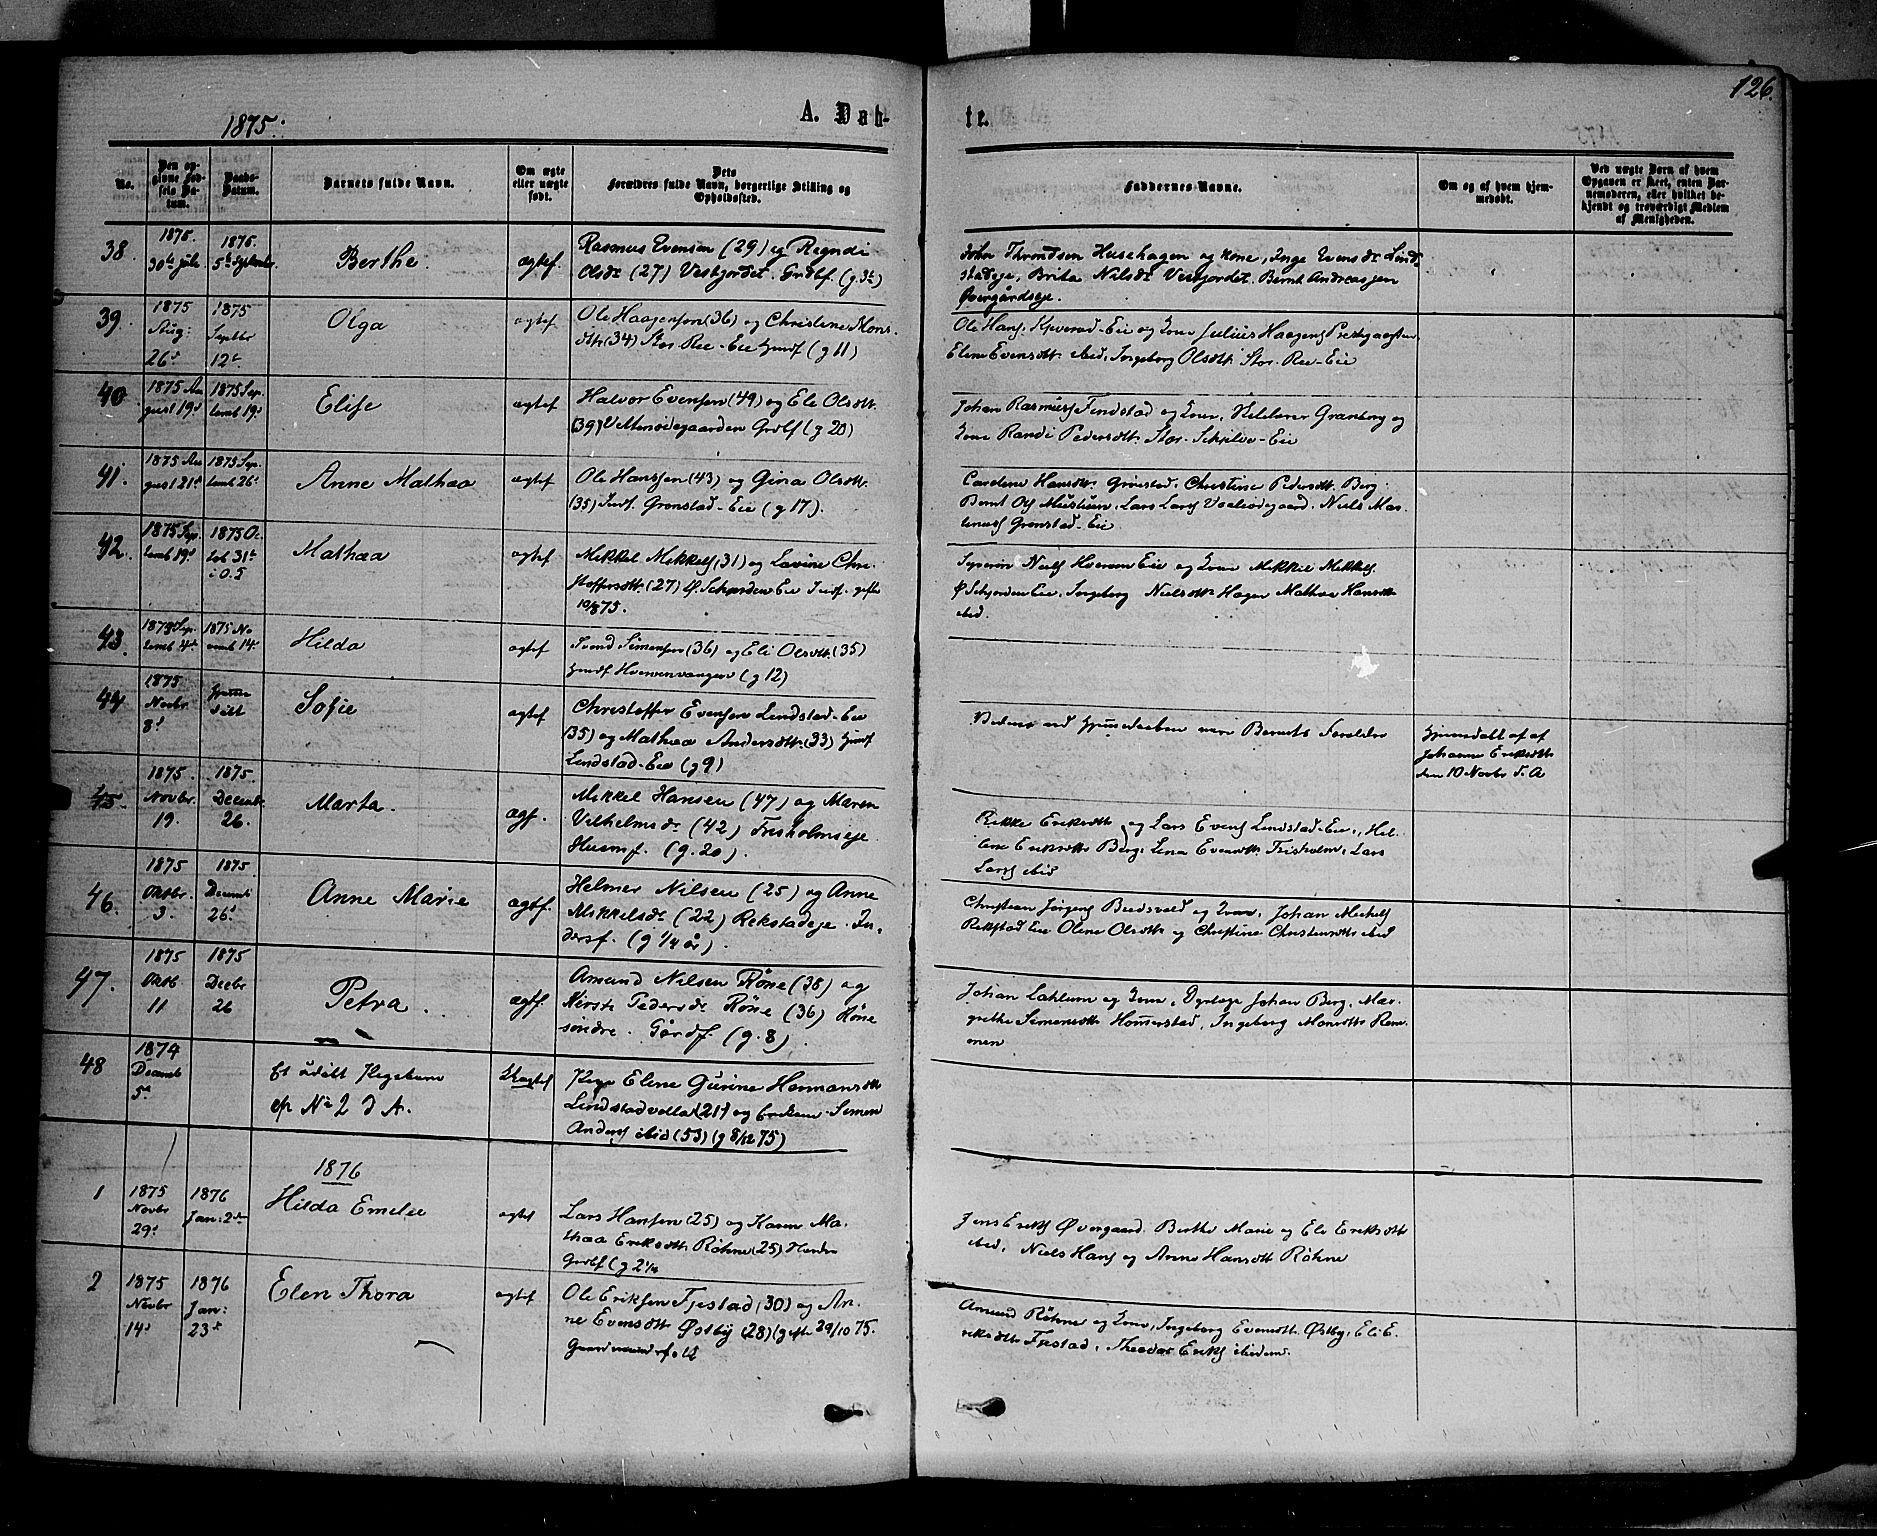 SAH, Stange prestekontor, K/L0013: Ministerialbok nr. 13, 1862-1879, s. 126